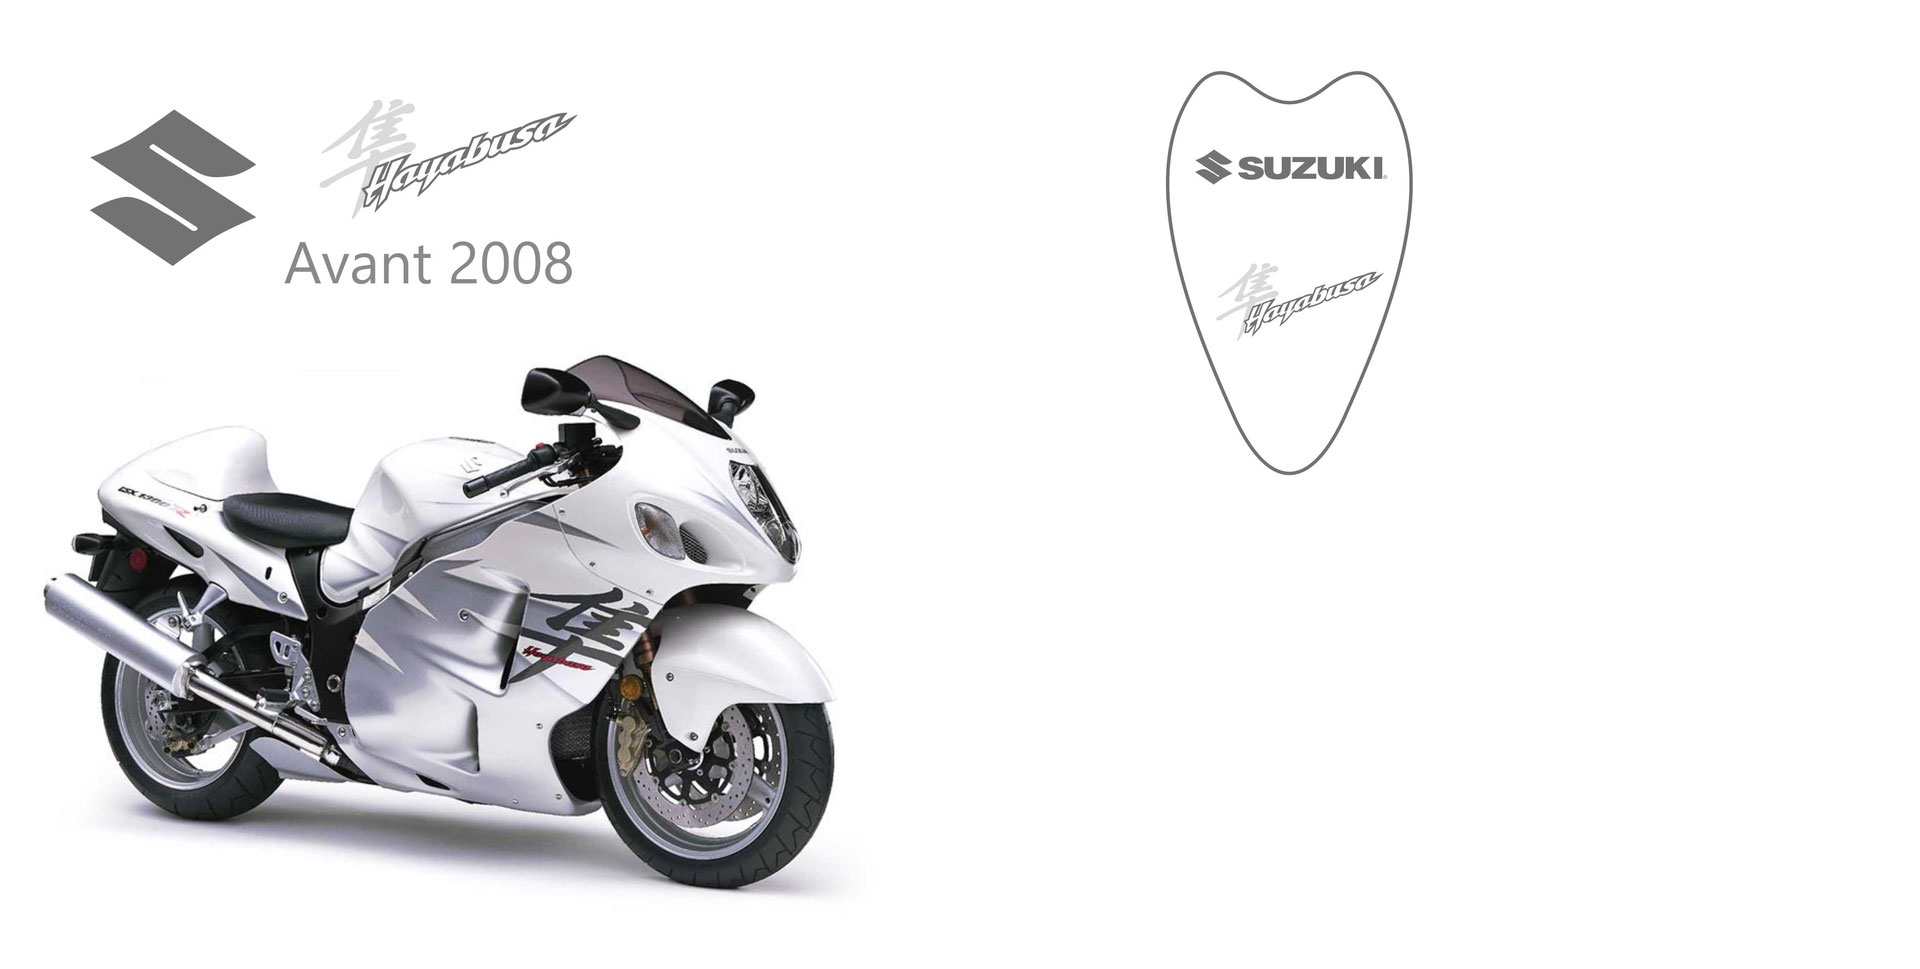 suzuki gsx 1300 r hayabusa avant 2008